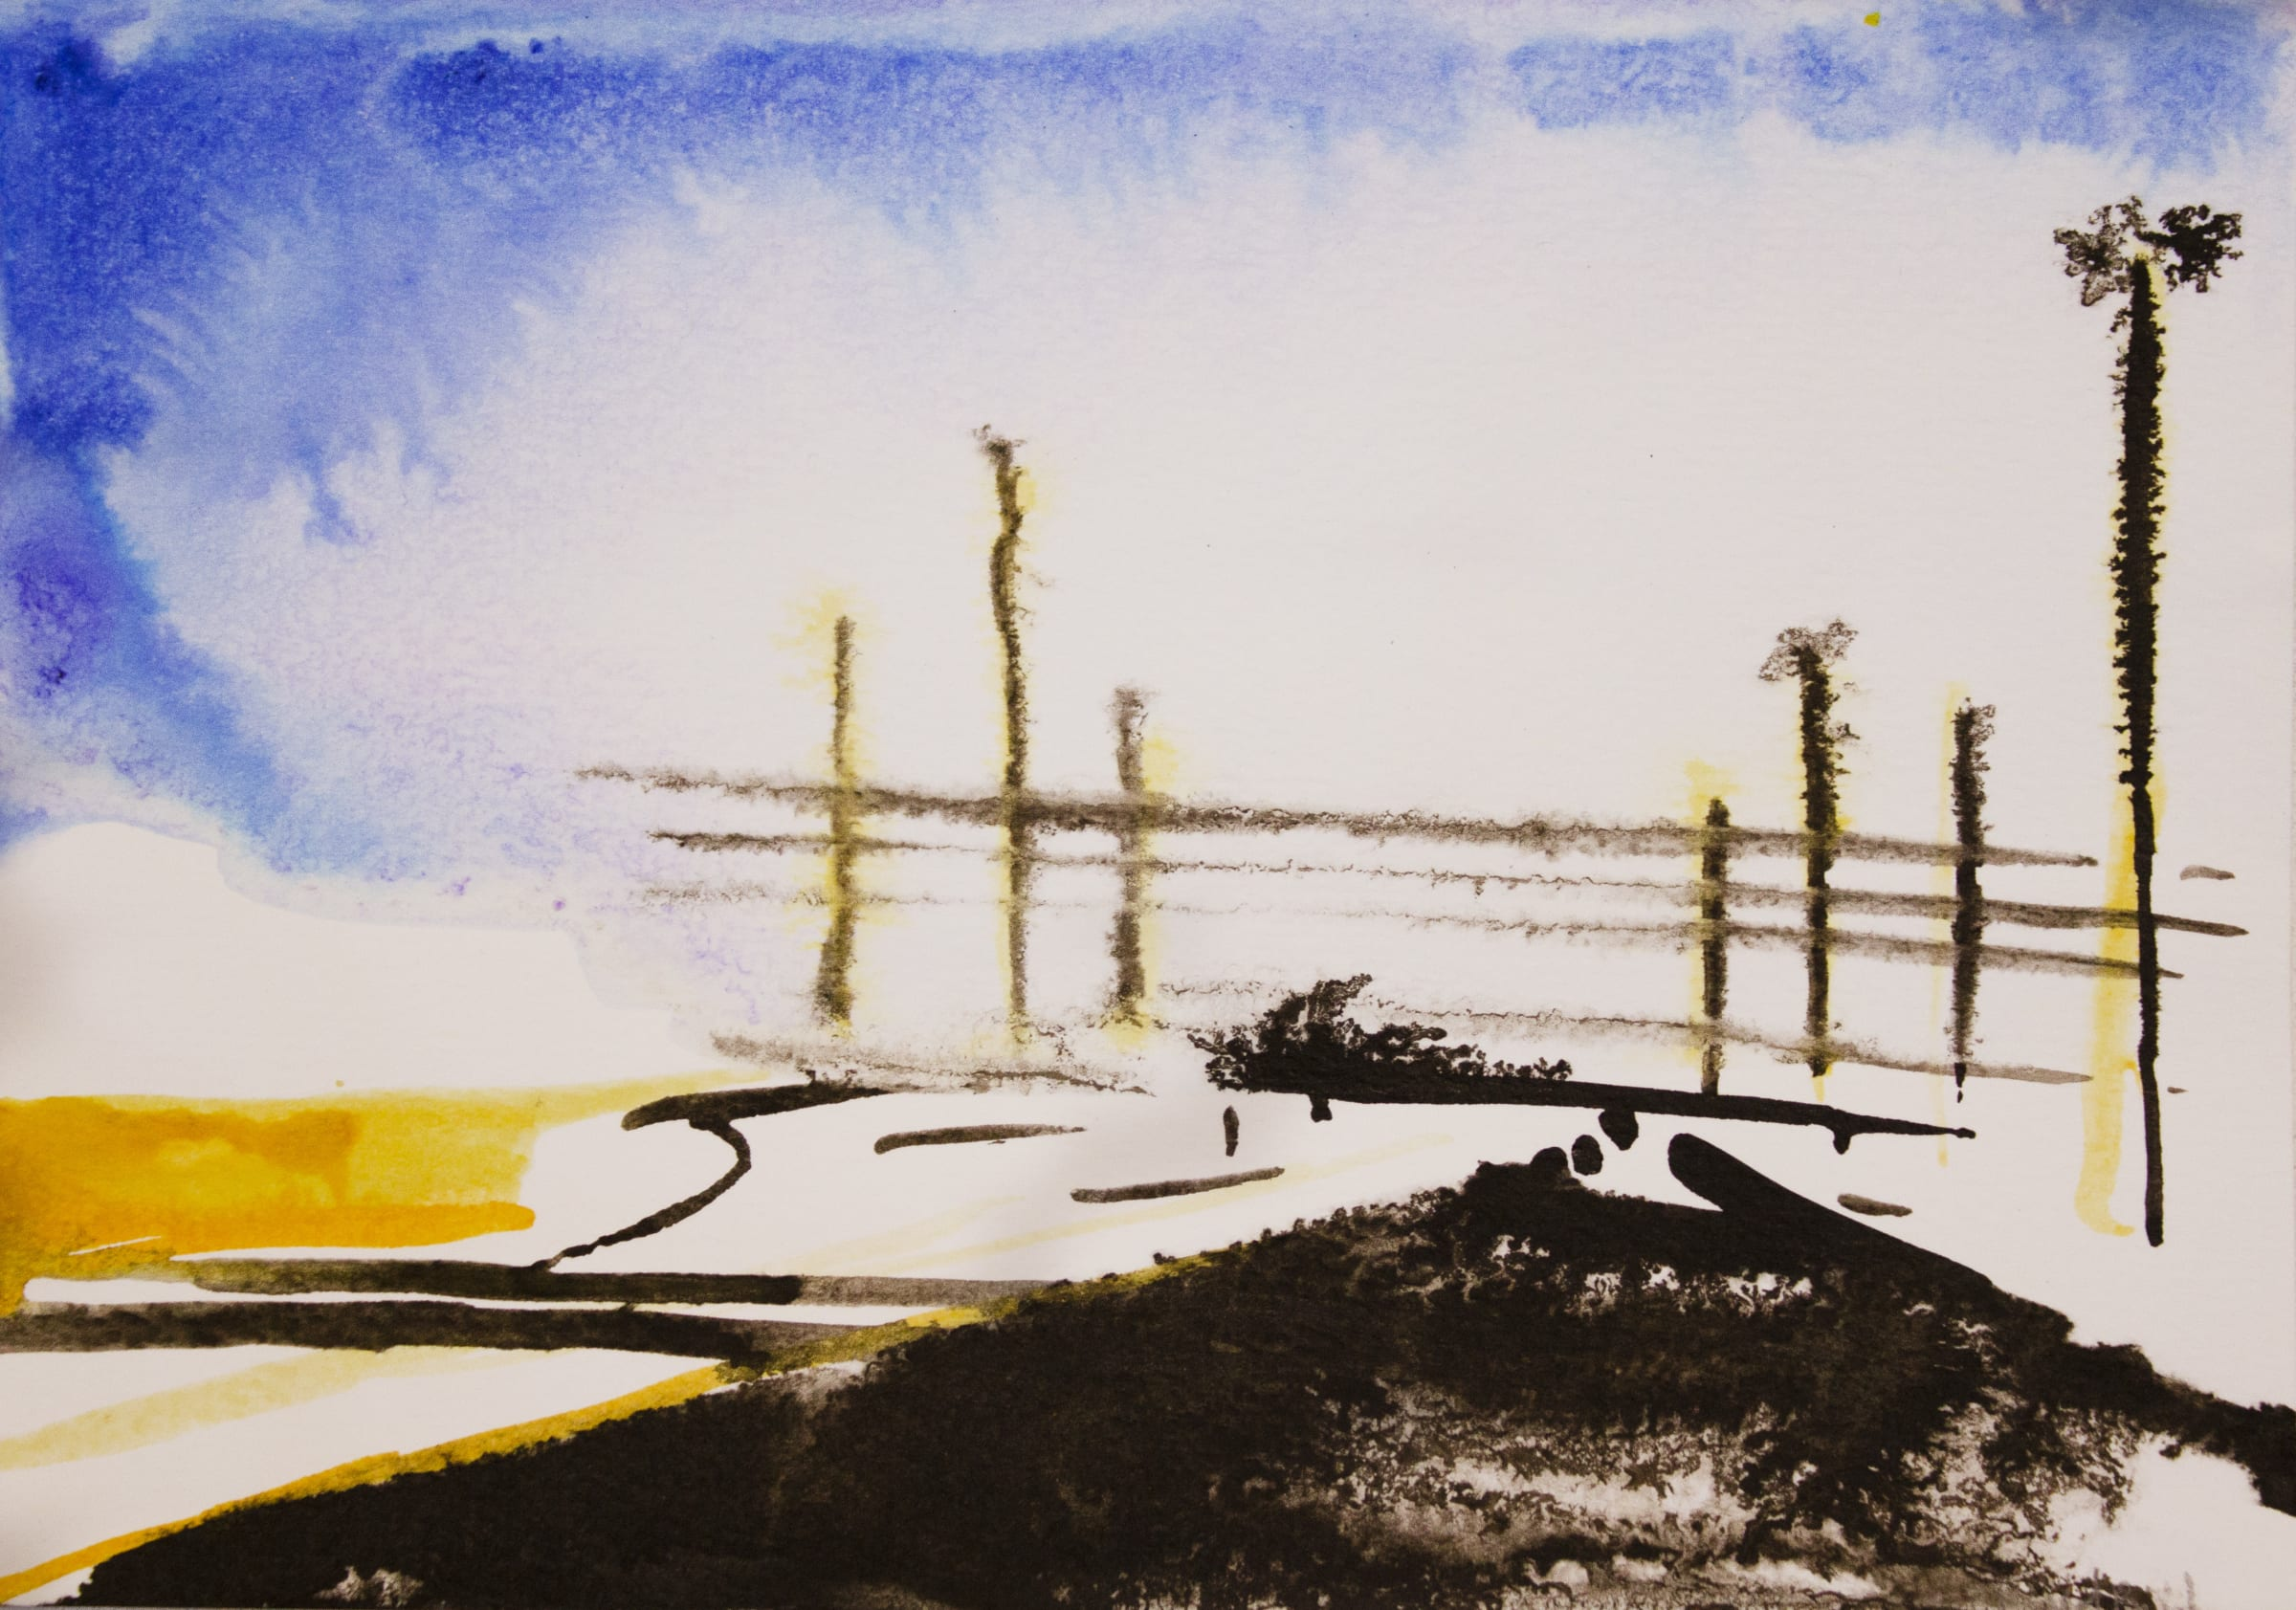 <span class=&#34;link fancybox-details-link&#34;><a href=&#34;/artists/88-louise-van-der-bijl/works/2282-louise-van-der-bijl-inktober-day-2-2018/&#34;>View Detail Page</a></span><div class=&#34;artist&#34;><strong>Louise Van Der Bijl</strong></div> <div class=&#34;title&#34;><em>Inktober Day 2</em>, 2018</div> <div class=&#34;medium&#34;>Ink On Paper</div> <div class=&#34;dimensions&#34;>14.9cm x 21.1cm</div><div class=&#34;price&#34;>R400.00</div>